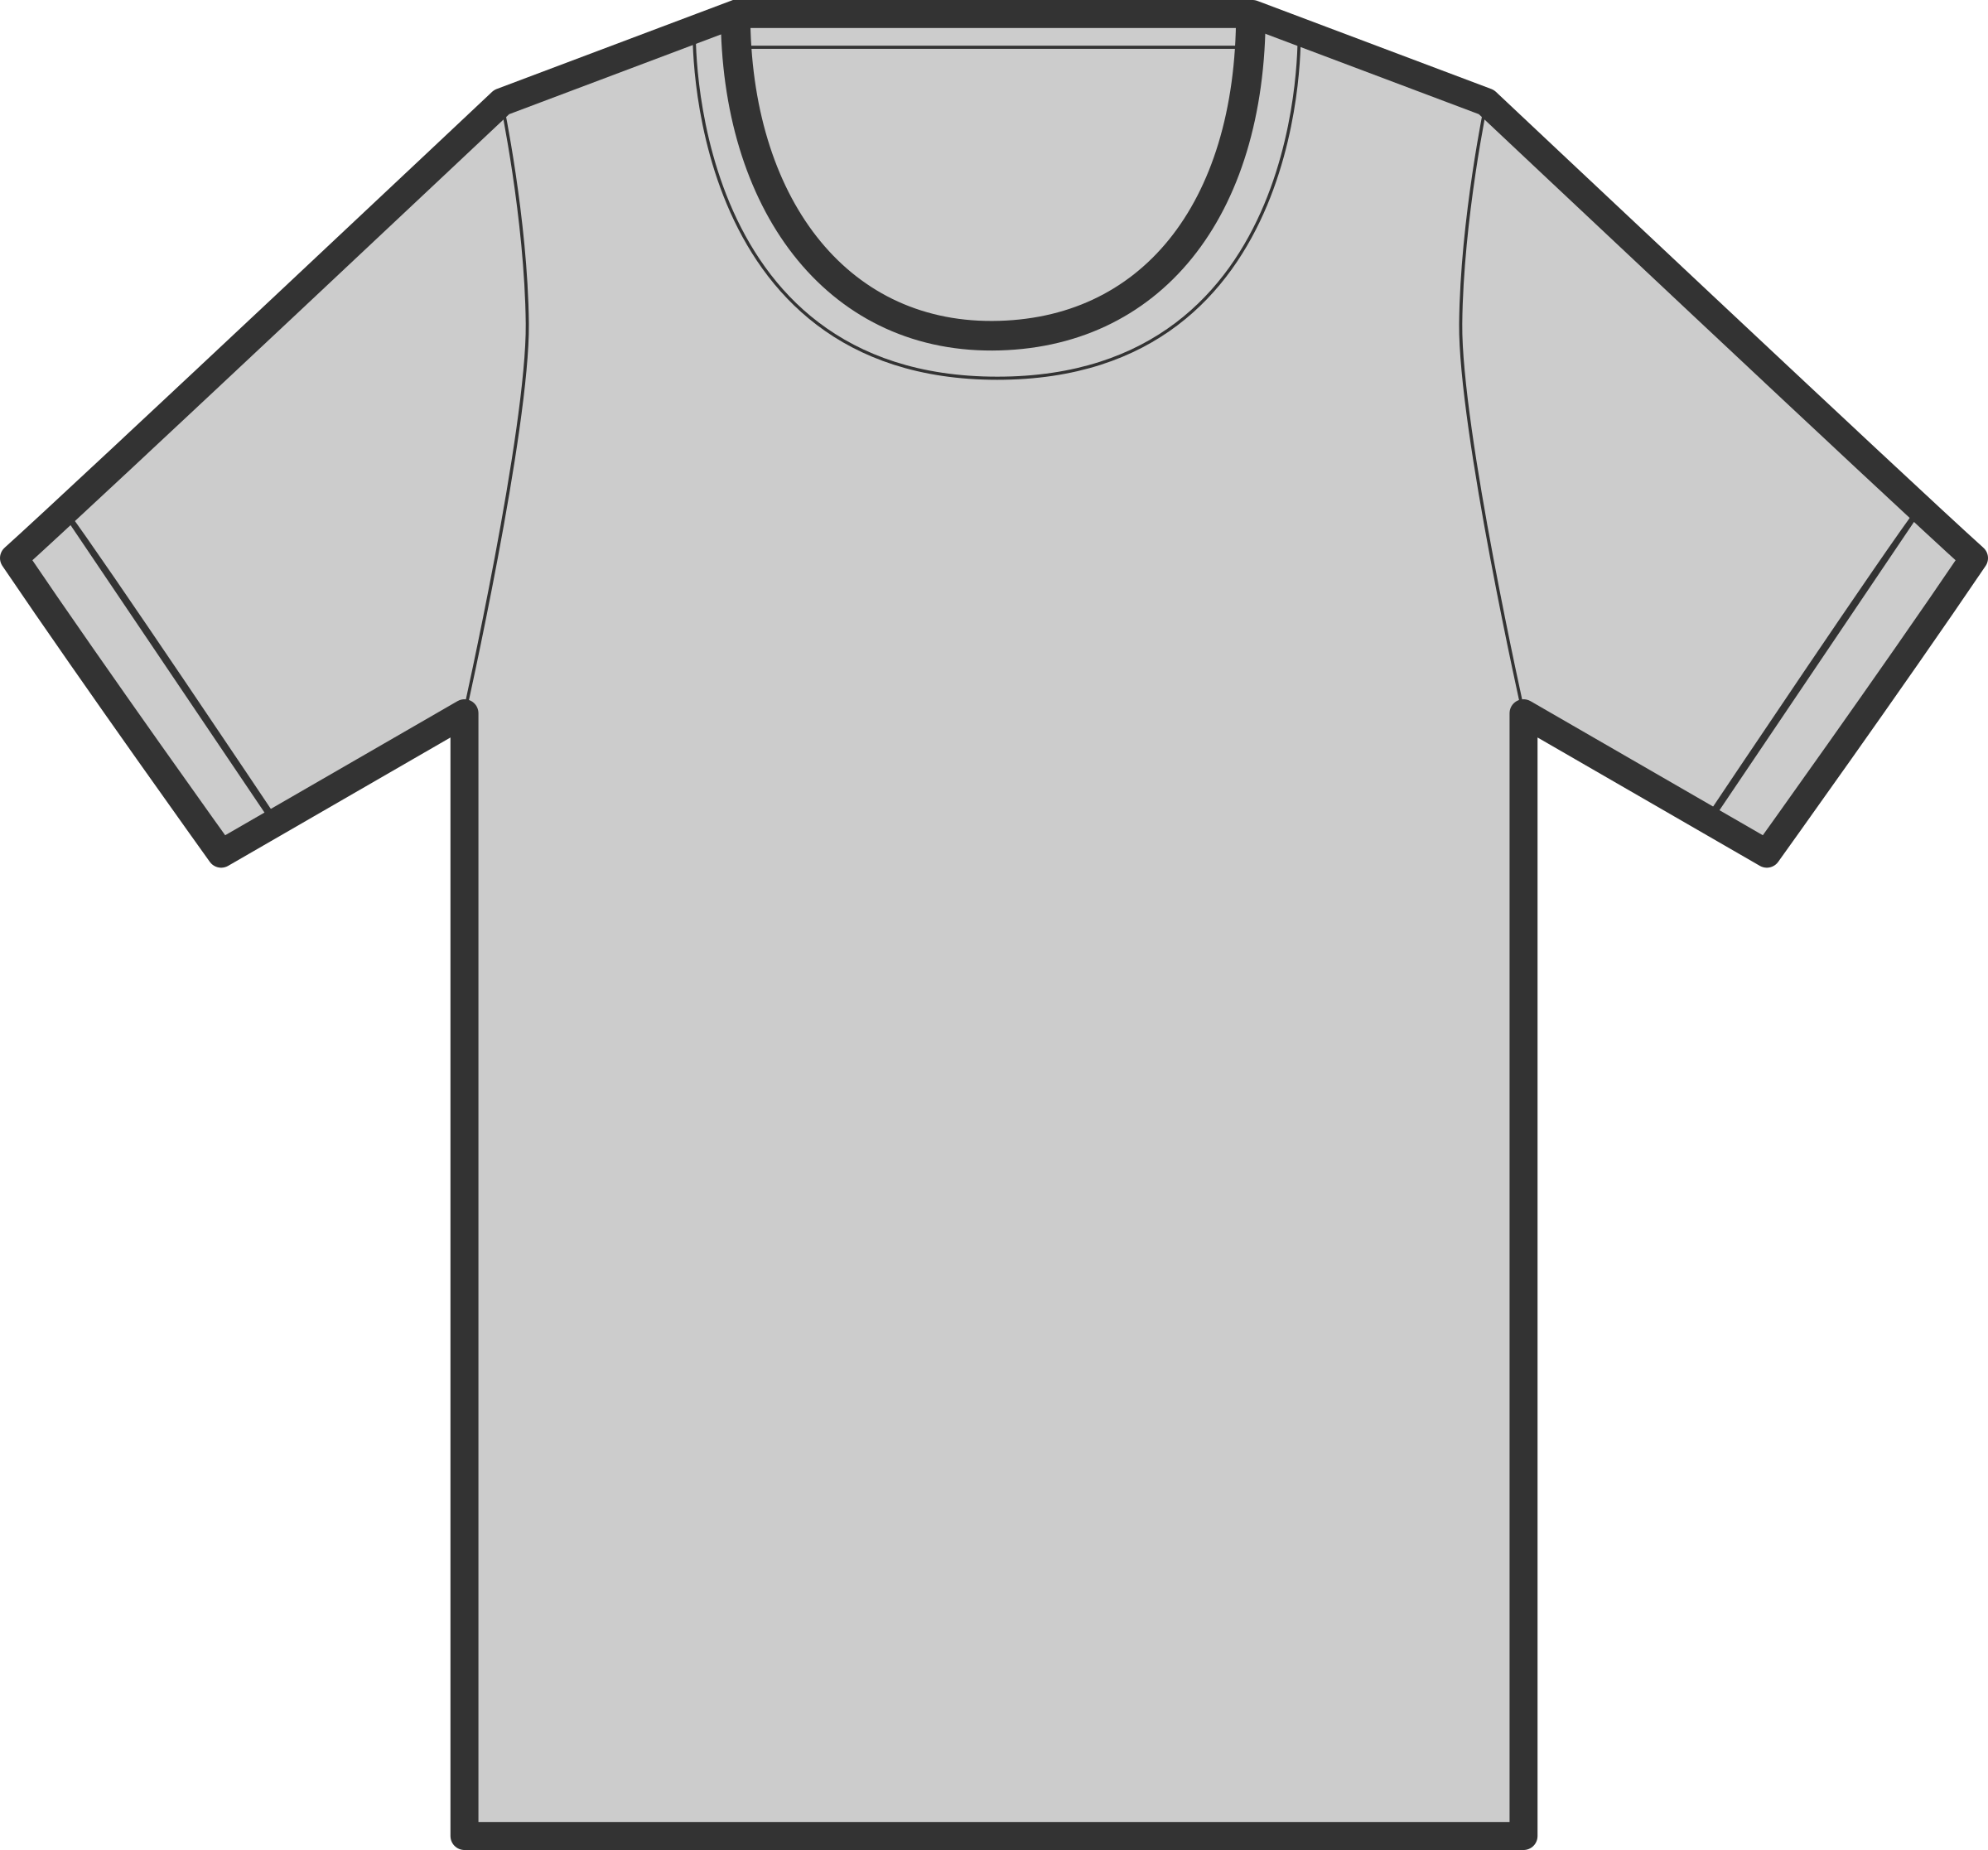 Jersey clipart transparent.